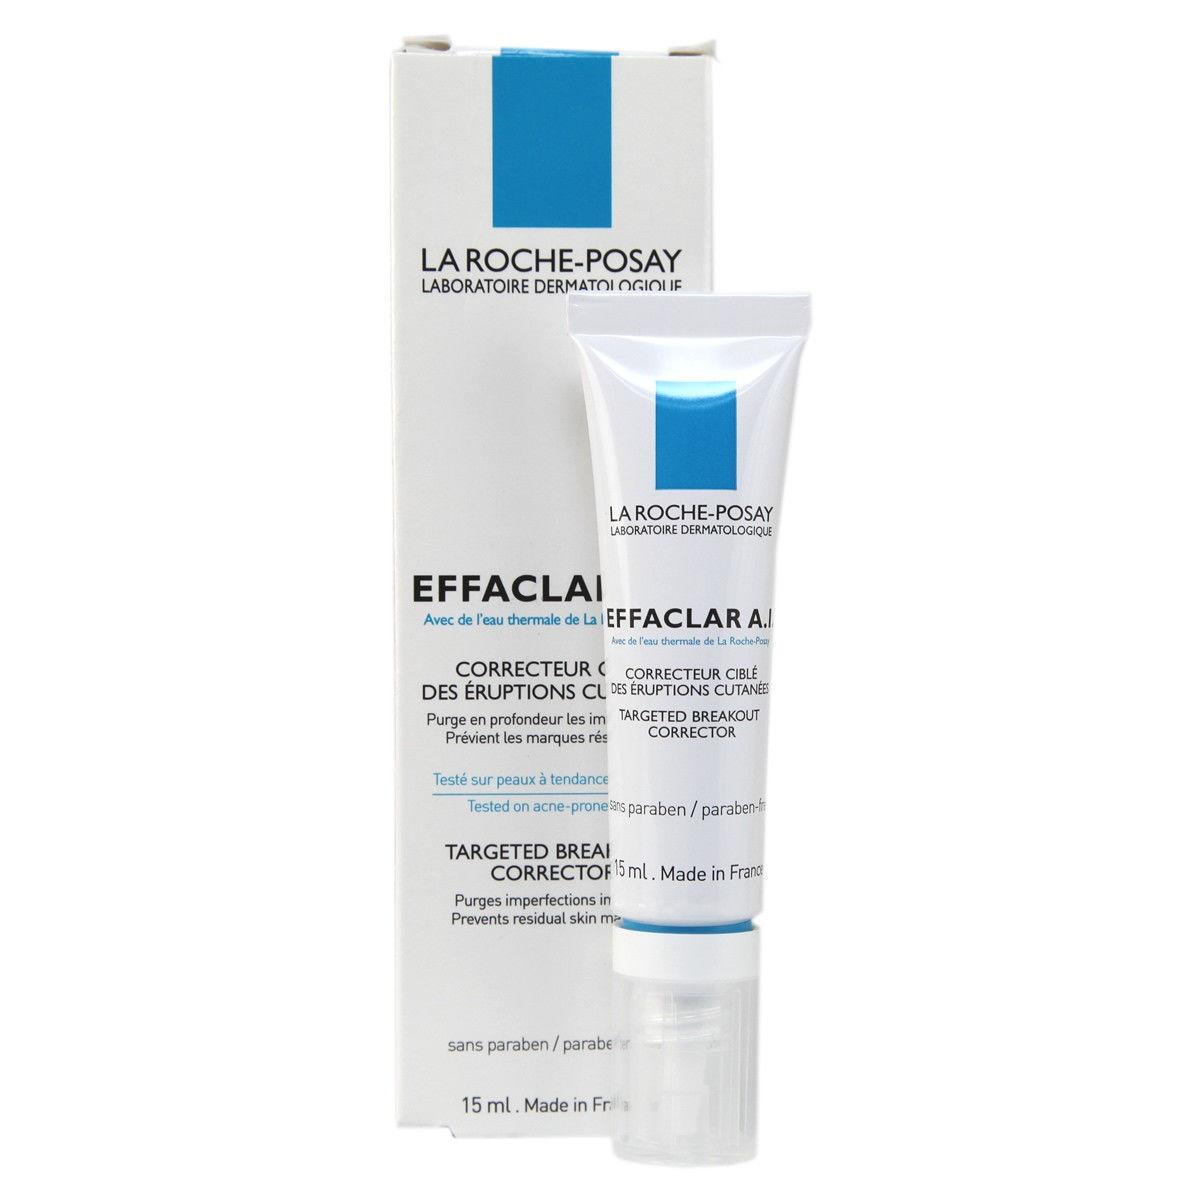 Kem trị mụn chuyên biệt cho nam LA ROCHE-POSAY EFFACLAR A.L